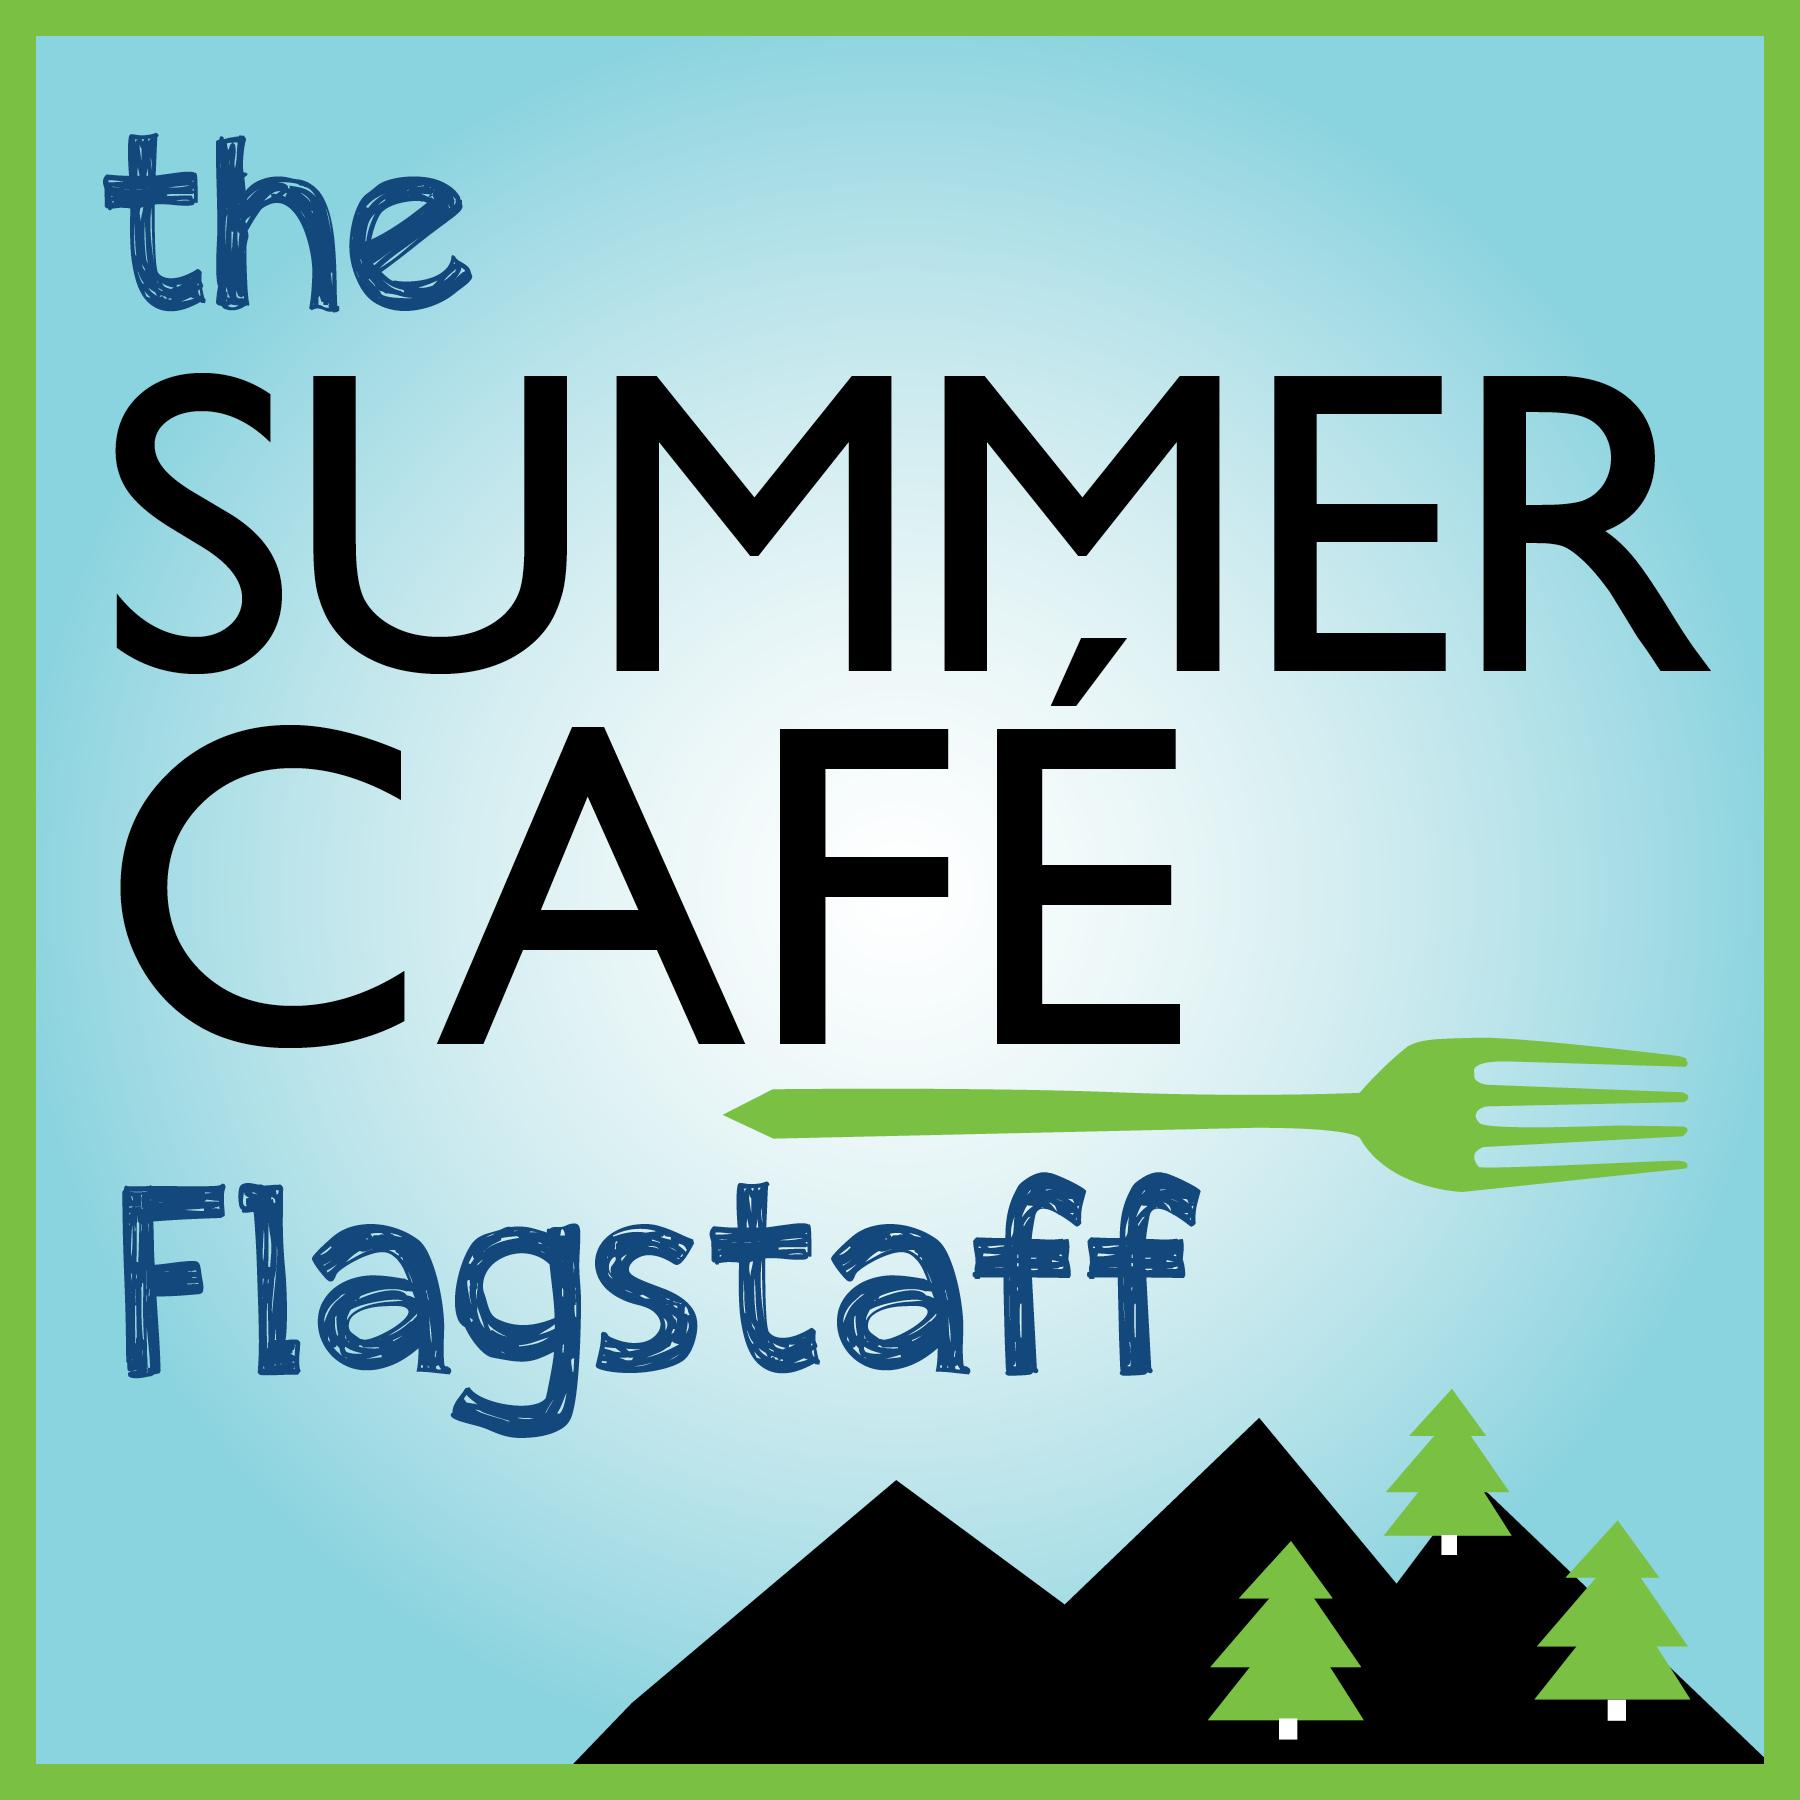 Mary S Cafe Flagstaff Menu